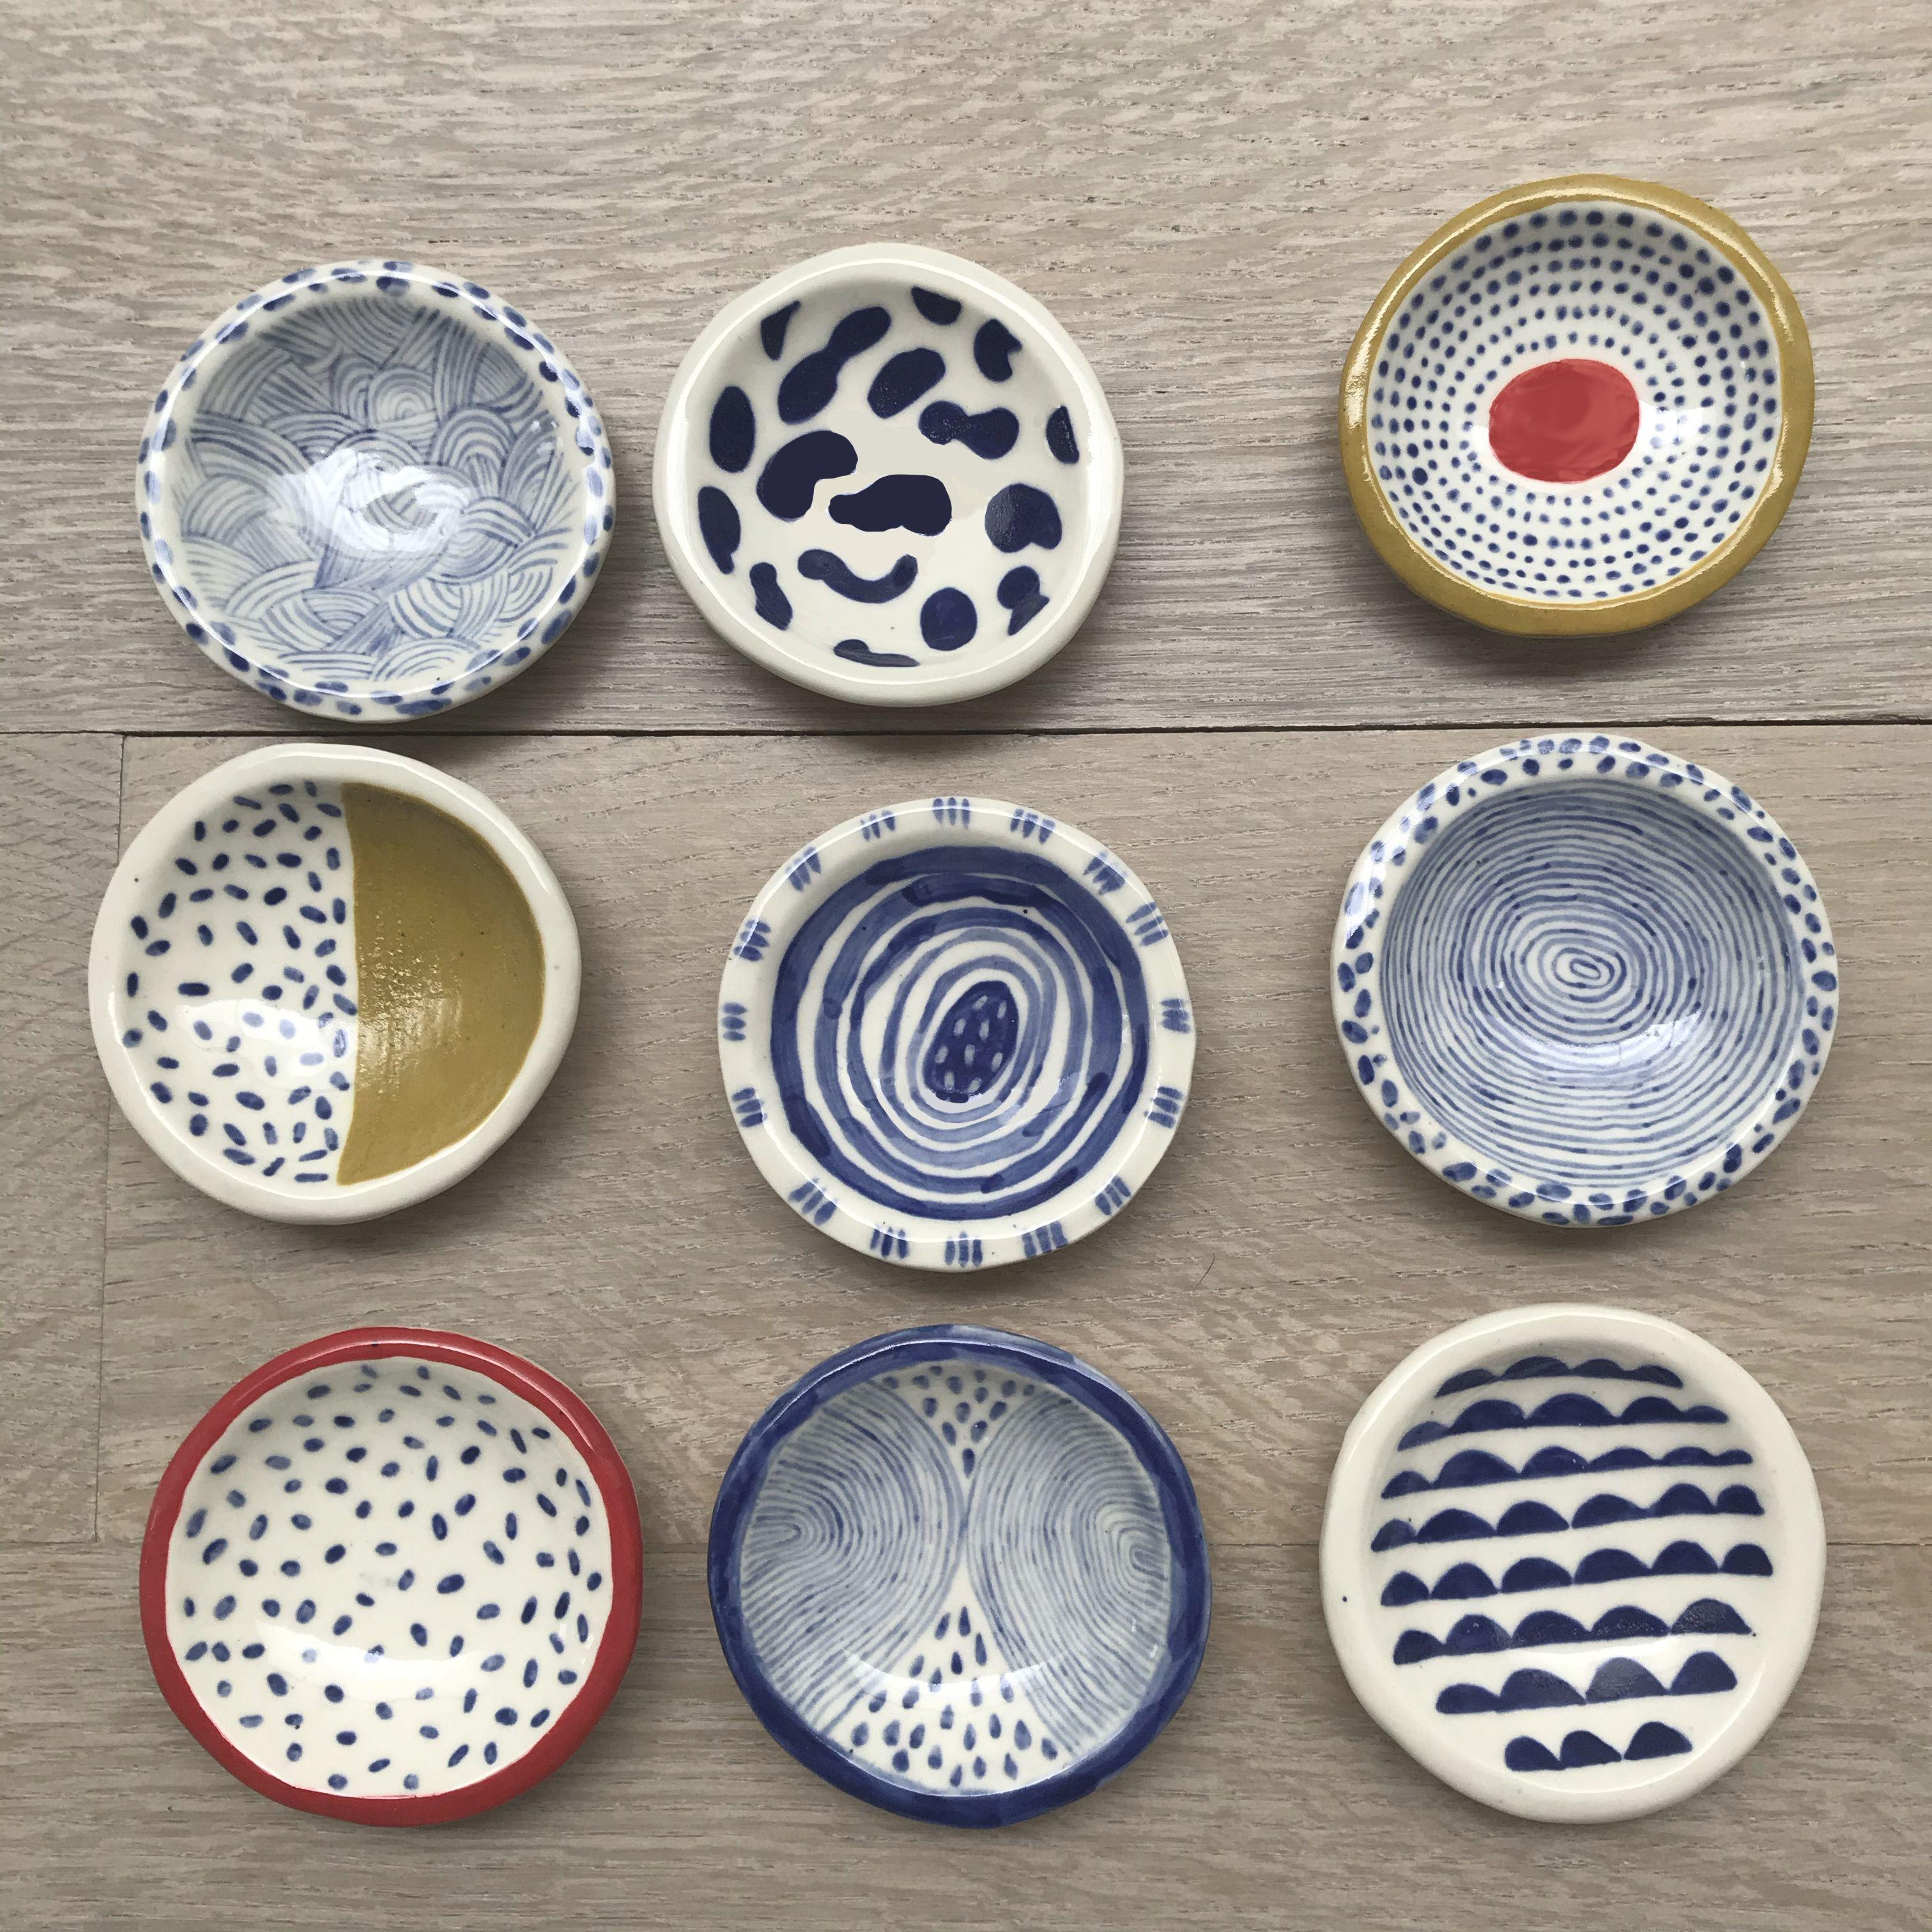 #pottery #ceramics #handmade #clay #art #ceramic #ceramicart #ceramica #keramik #instapottery #tableware #design #potterylove #handmadeceramics #contemporaryceramics #handmadepottery #pottersofinstagram #pottery #glaze #artist #ceramicartist #potterystudio #potterylife #craft #handbuiltpottery #handbuiltceramics #handbuildingwithclay #illustratedceramics